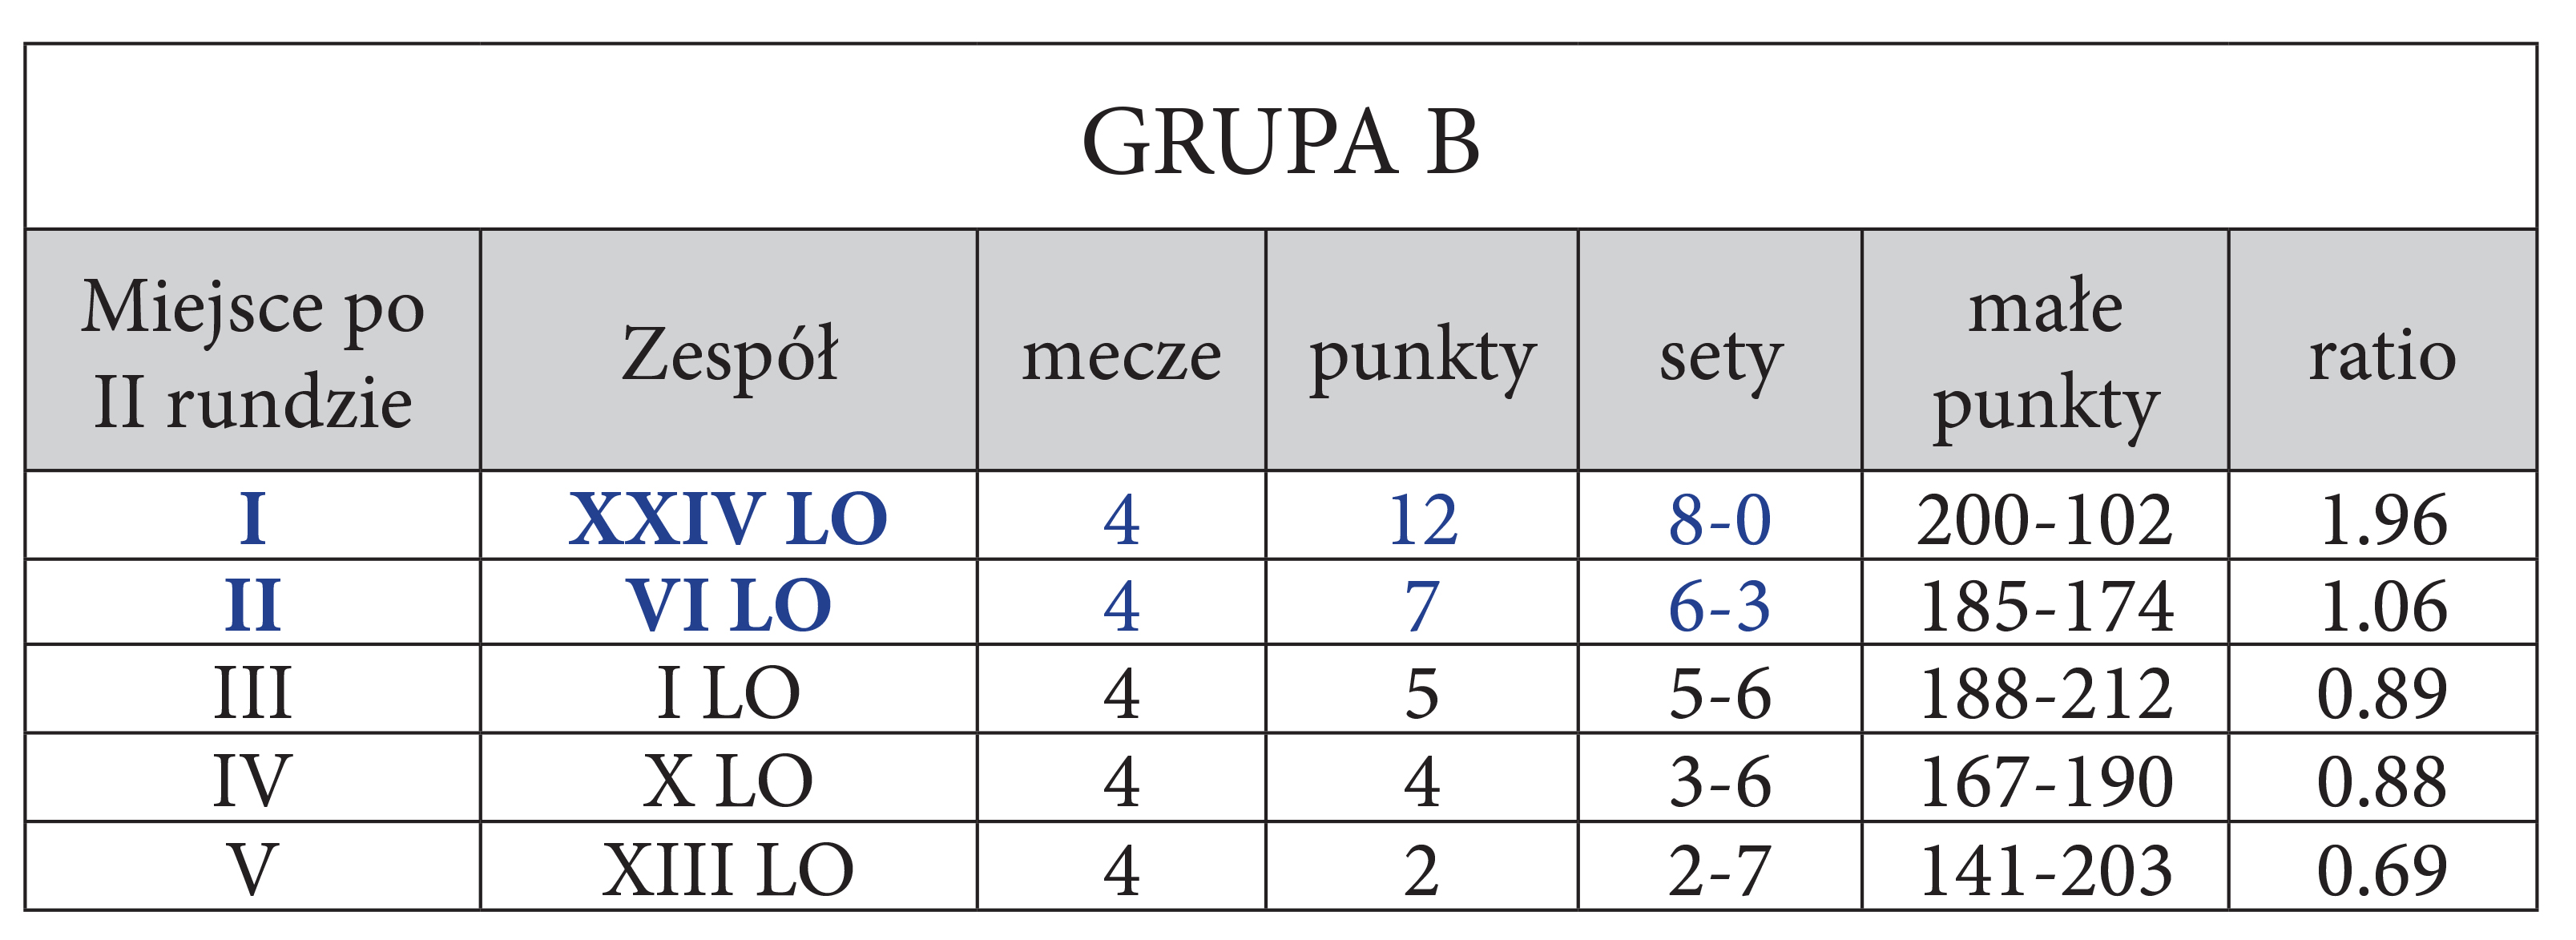 TABELA GRUPY B